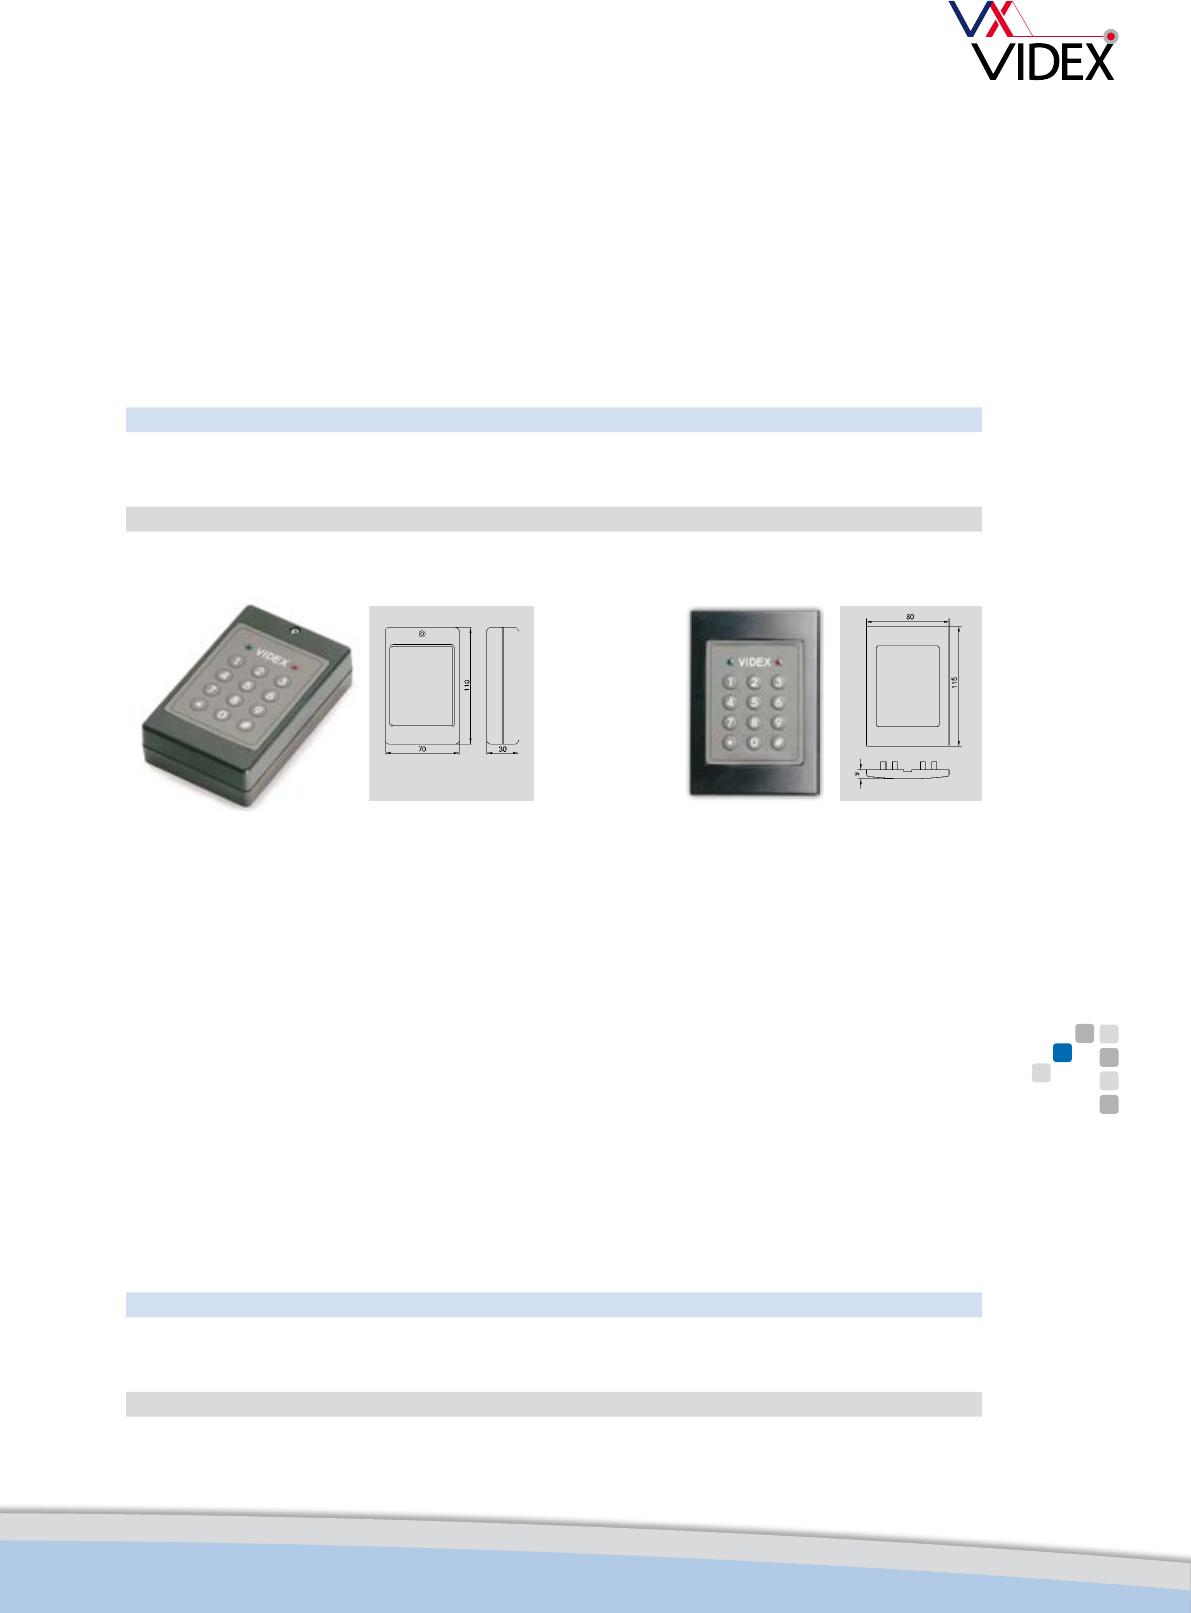 Vx Codelocks Videx Wiring Diagram 87